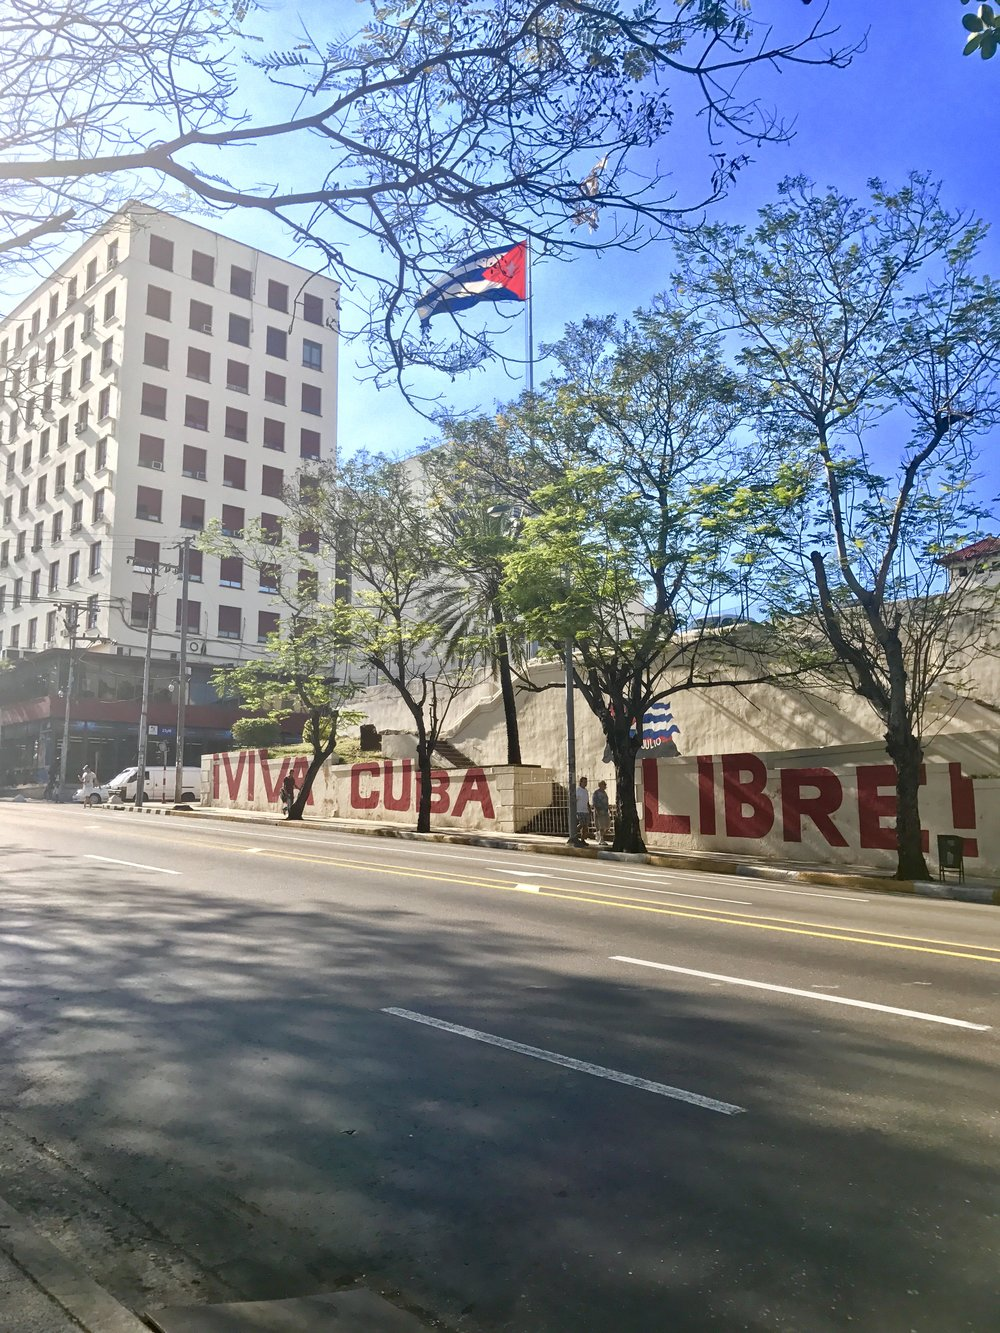 Live Free Cuba